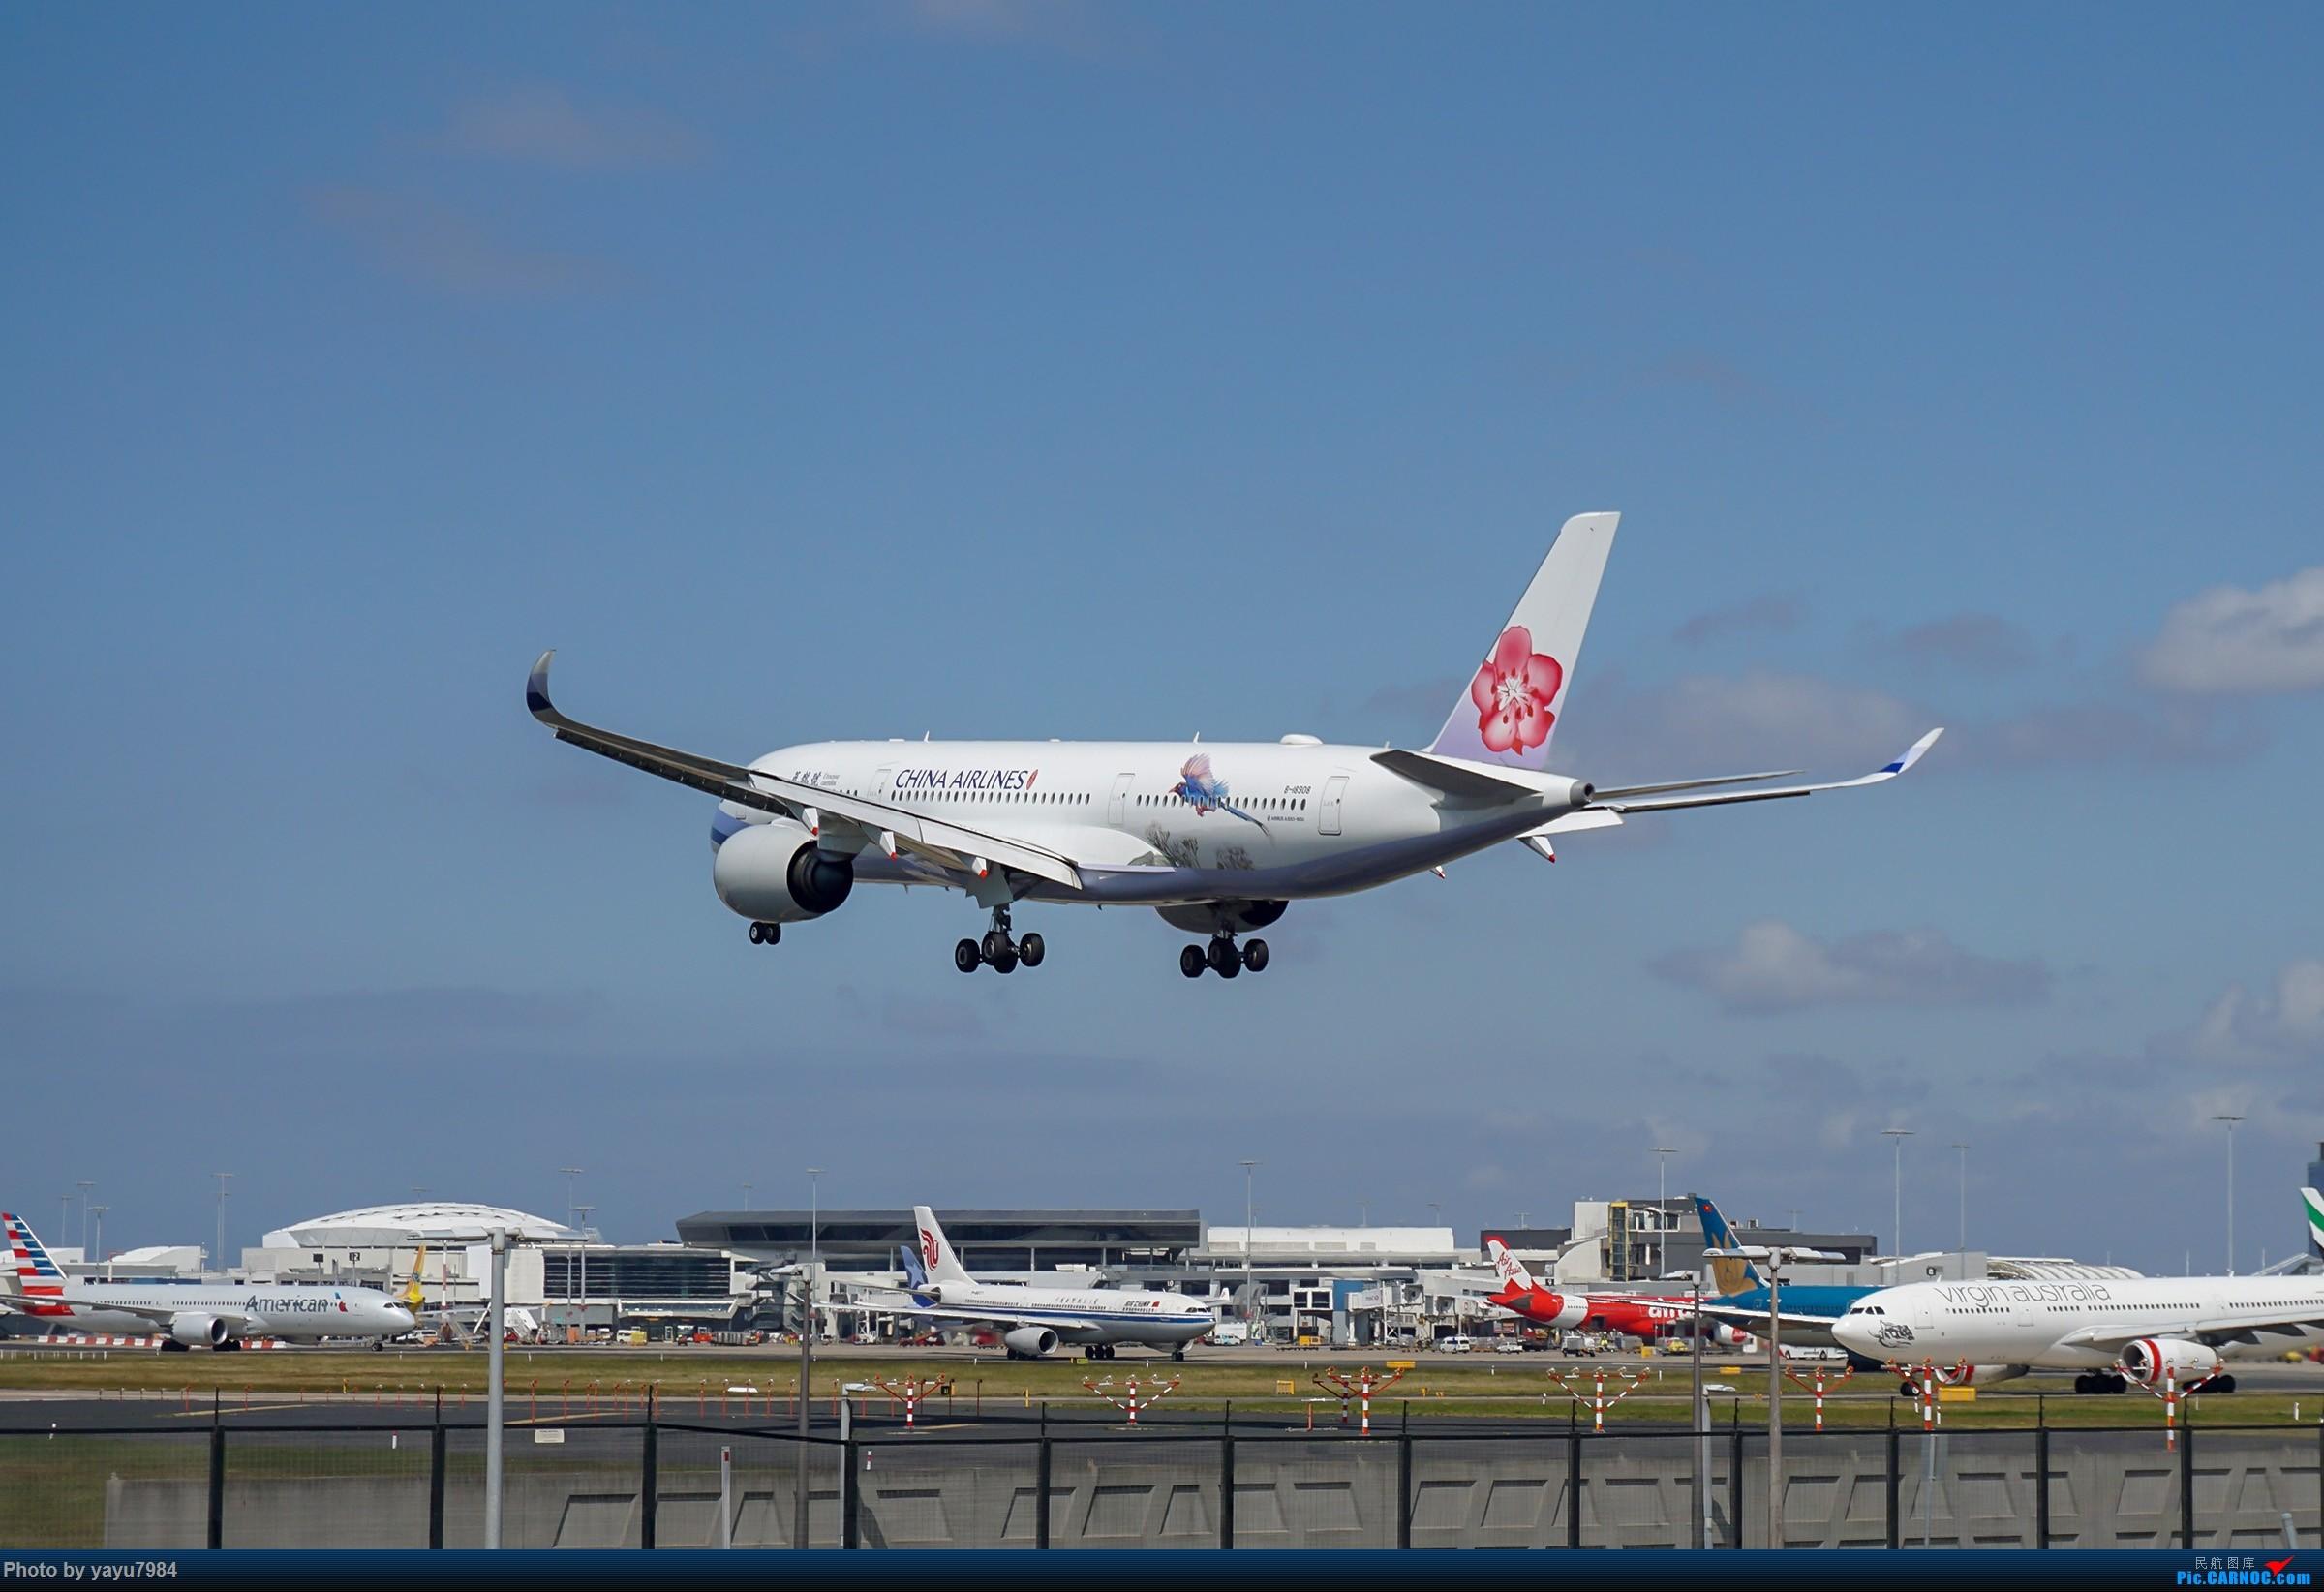 Re:[原创][SYD] 东航天合332,雪绒花343,华航蓝鹊,以及其他日常货 AIRBUS A350-900 B-18908 澳大利亚悉尼金斯福德·史密斯机场